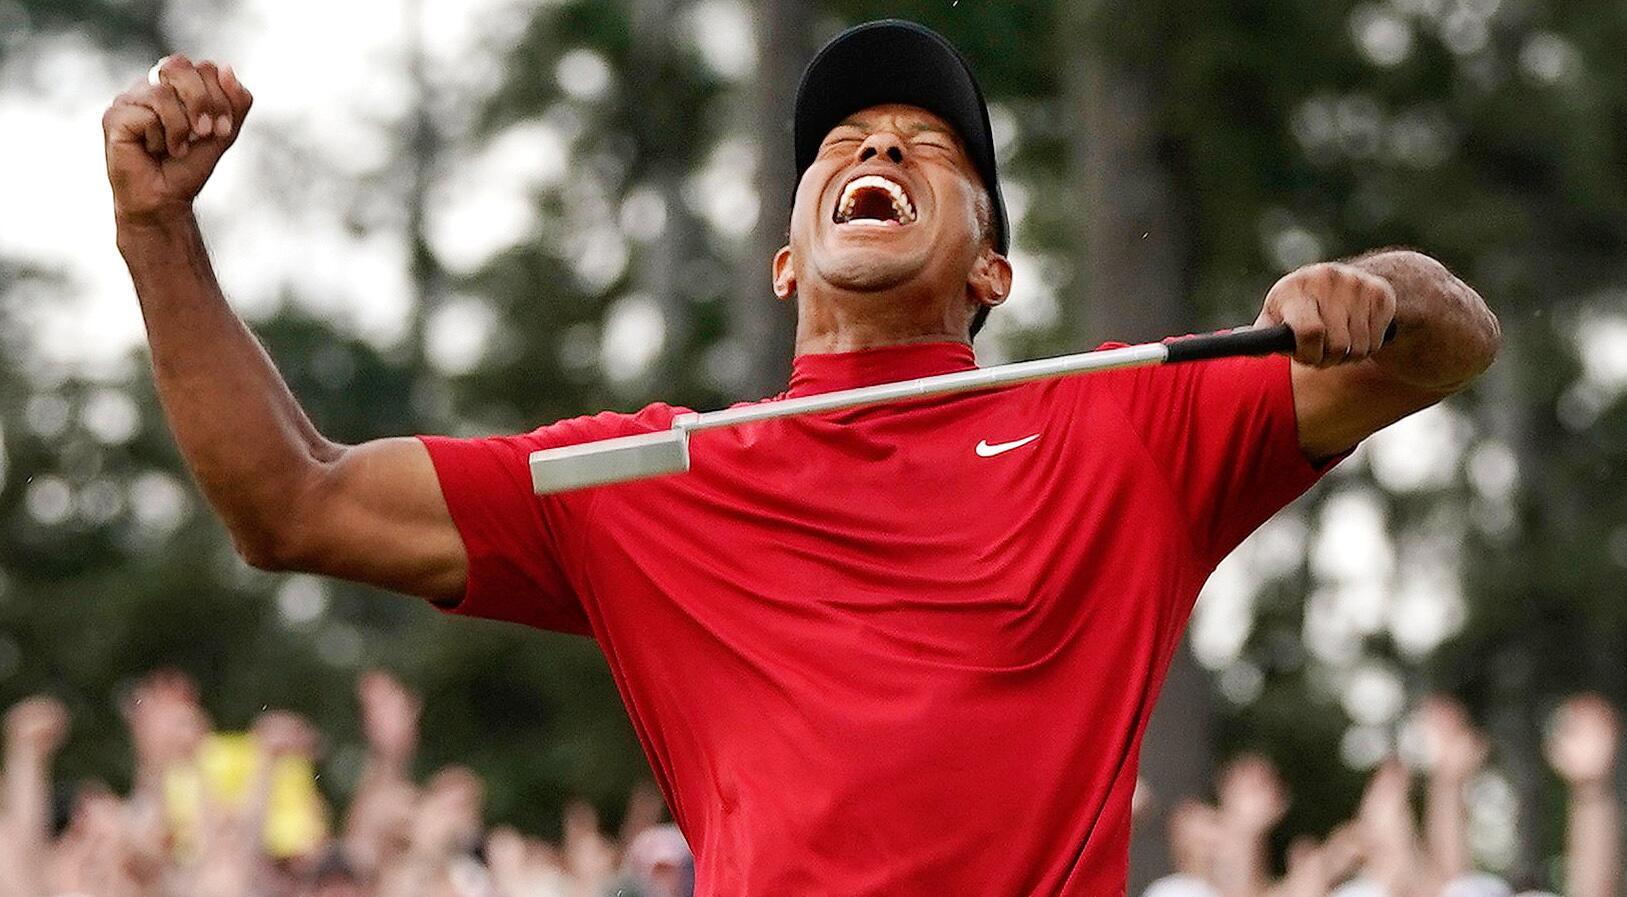 Bild zu Golf, US Masters, Tiger Woods, Sieg, Jubel, Freude